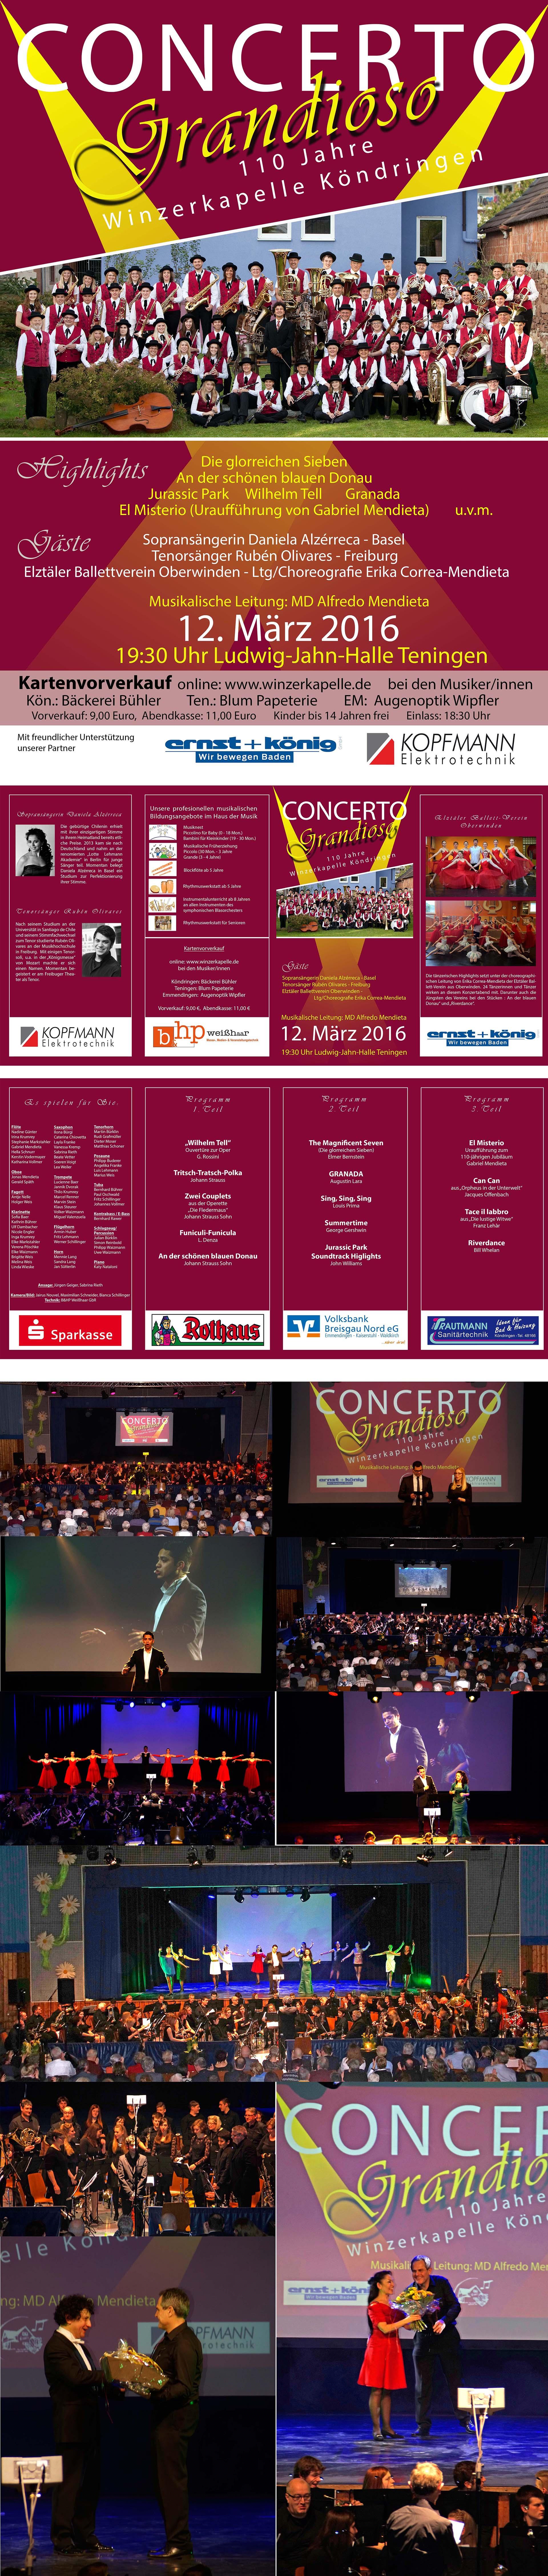 Concerto für Homepage2